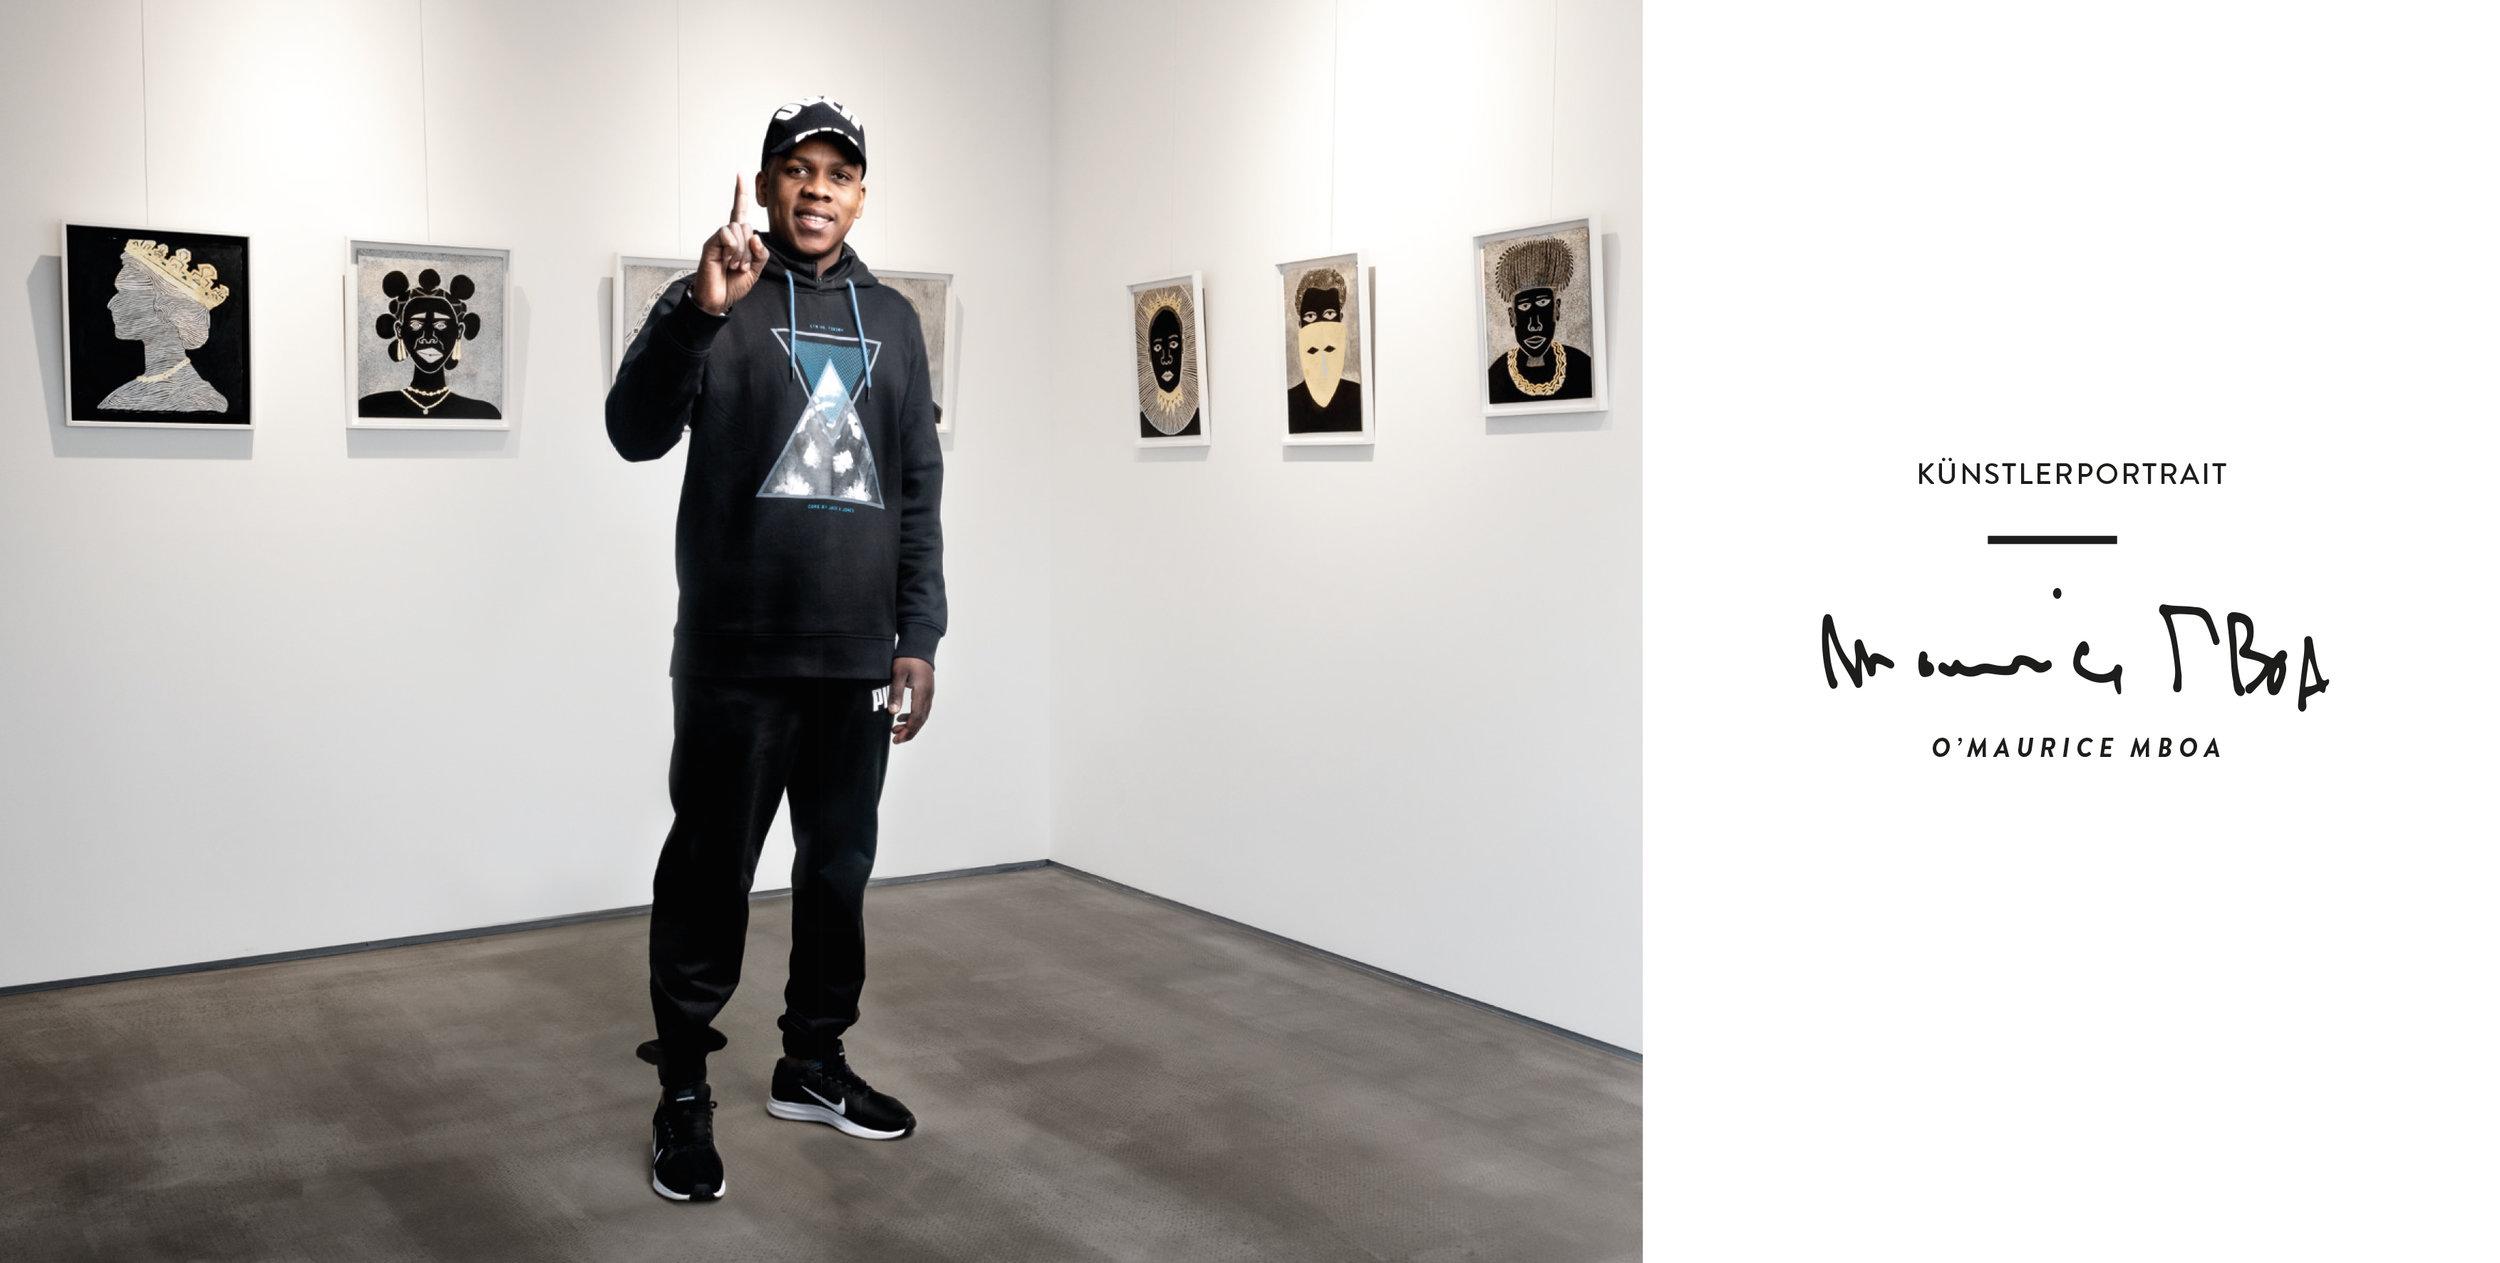 O'Maurice Mboa Künstlerportrait